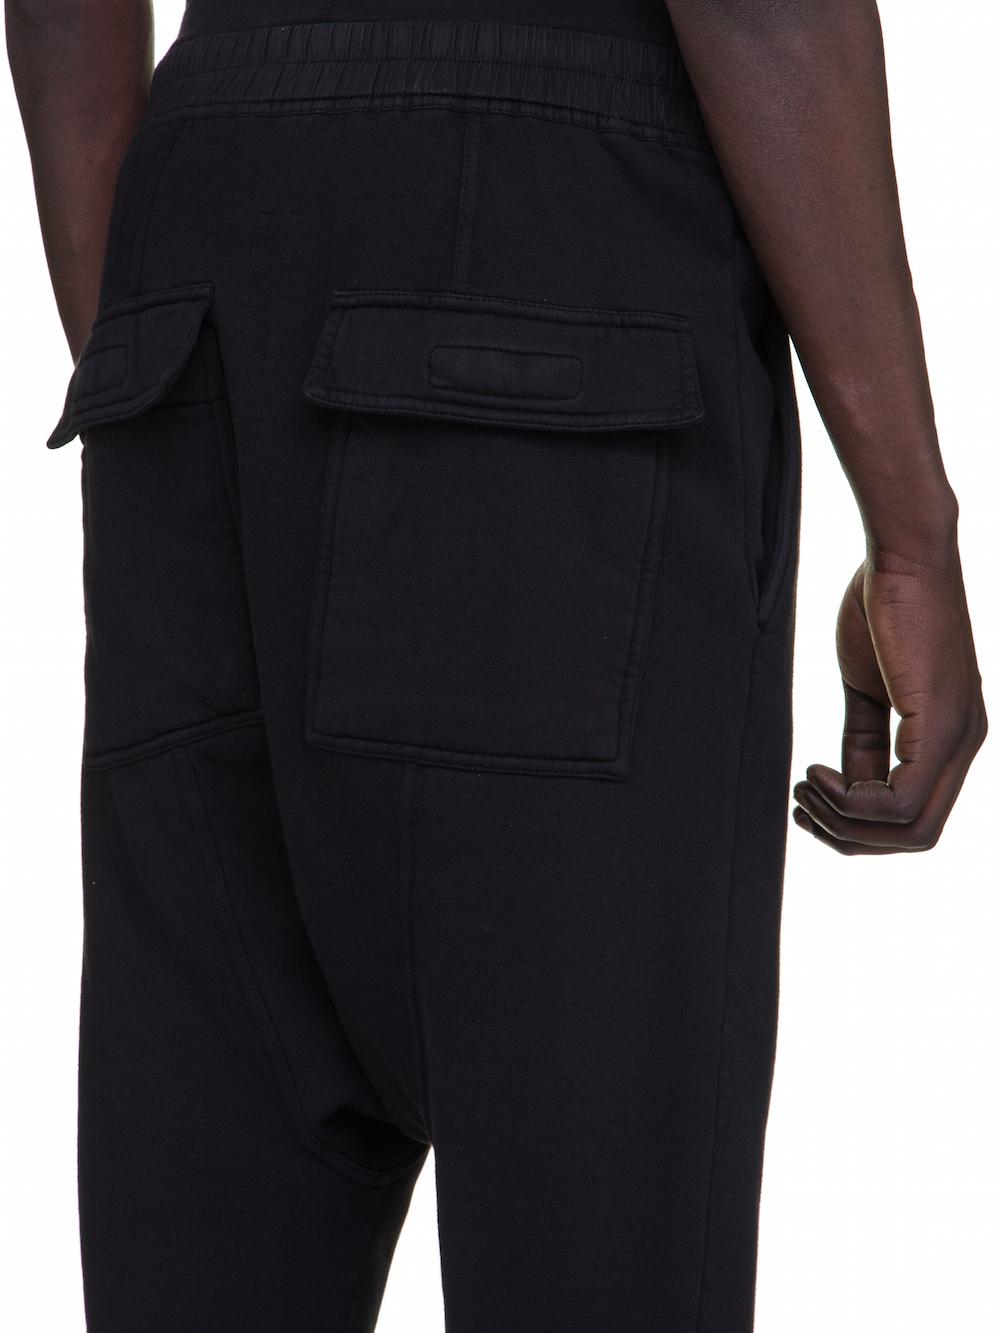 DRKSHDW FW18 SISYPHUS DRAWSTRING CROPPED PANTS IN BLACK